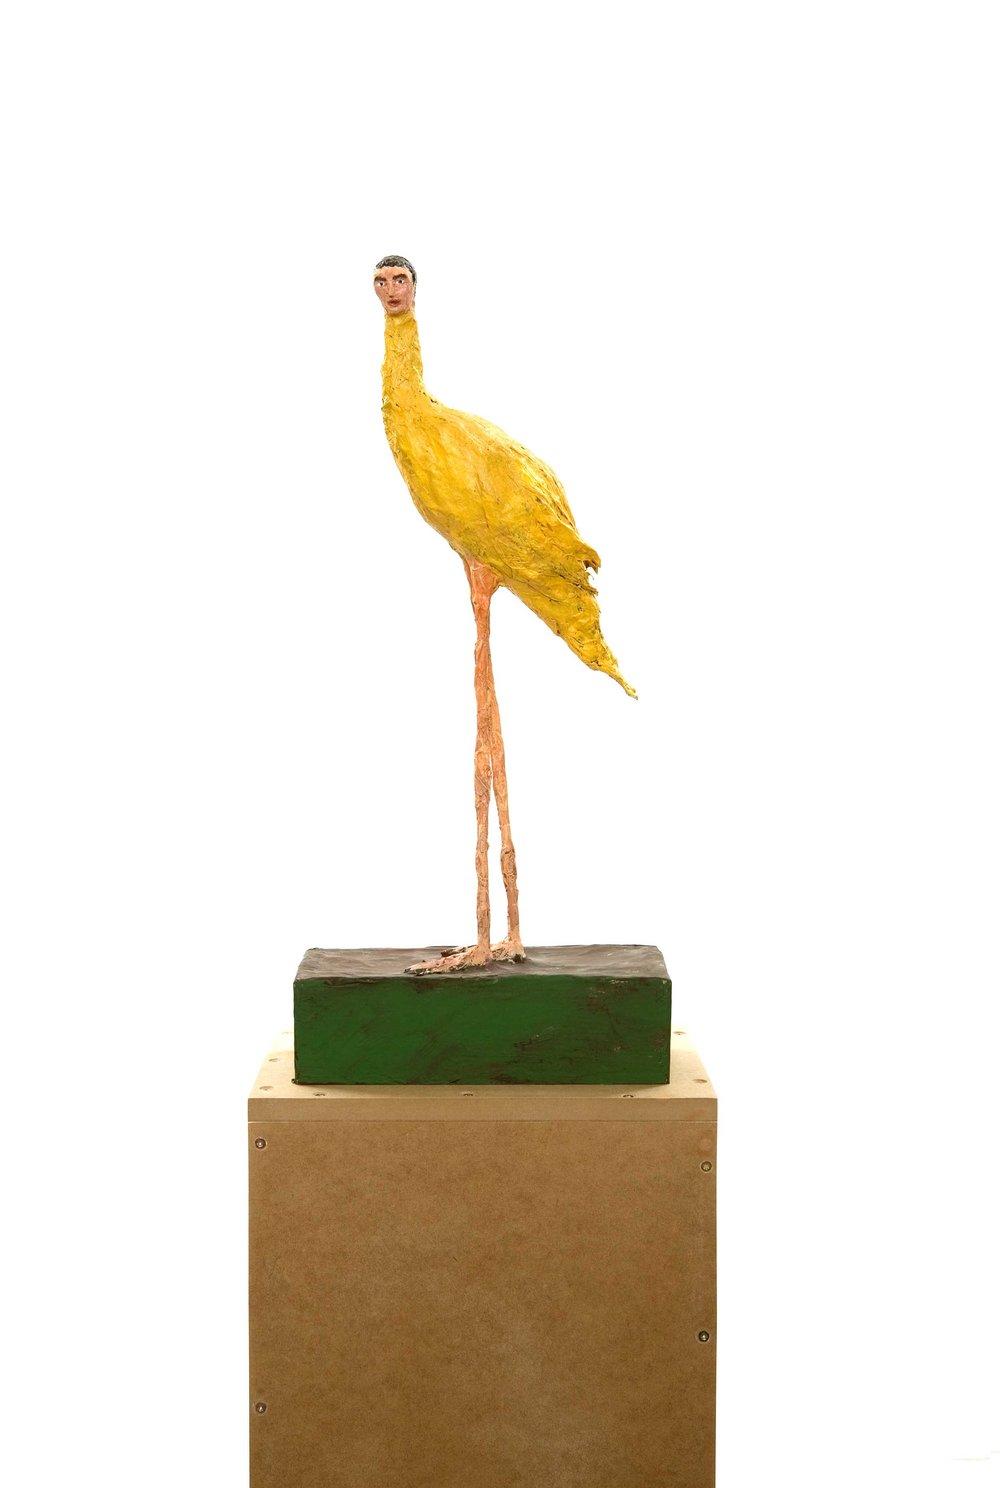 Birdman , 2010.Paper, glue, wire, wood, gouache, 55 x 11 x 25 cm.